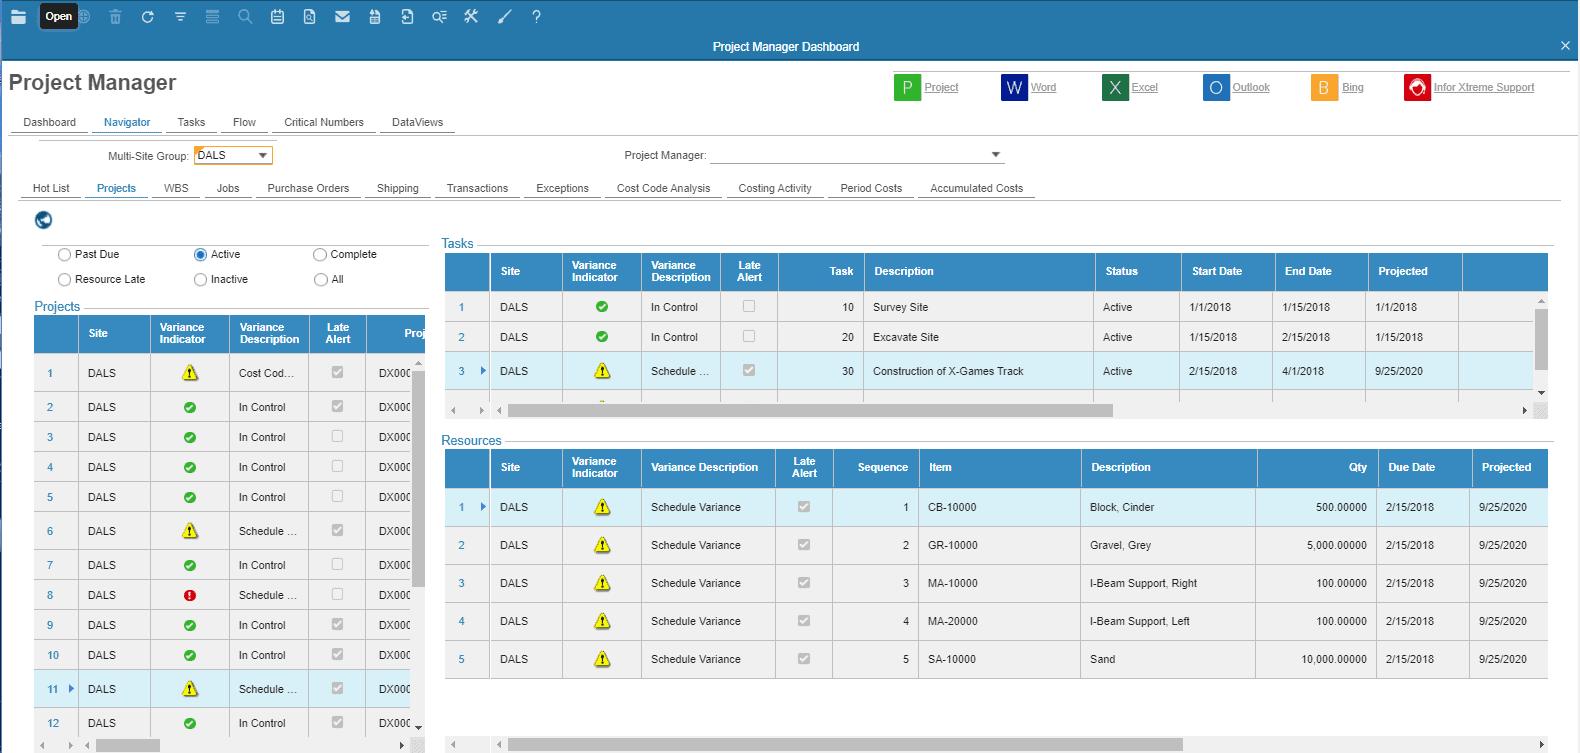 Screen capture of Program management dashboard